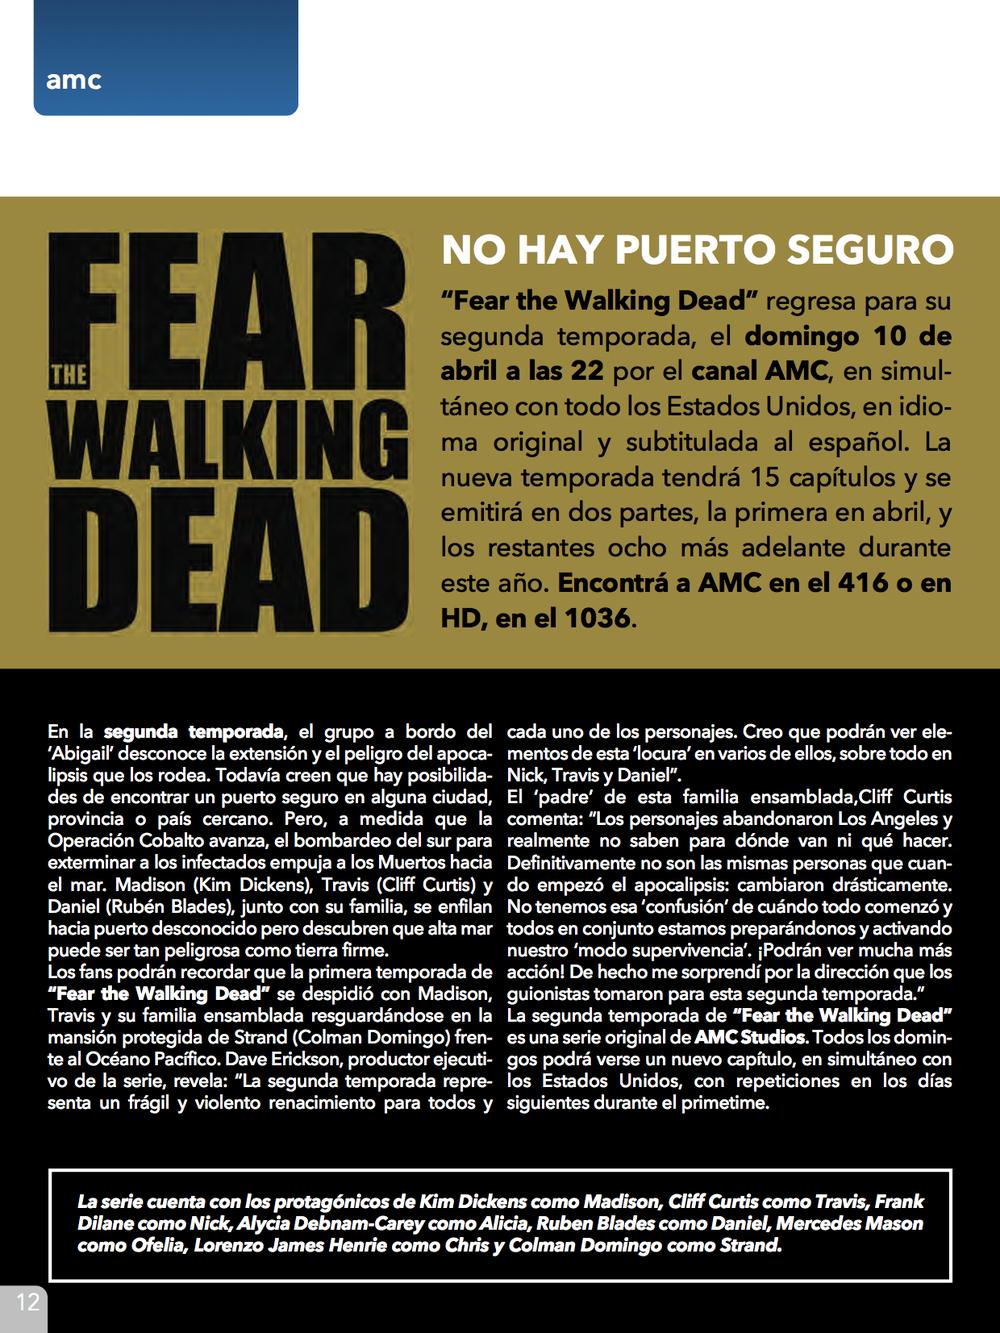 Telecentro Argentina | FTWD Pagina 2